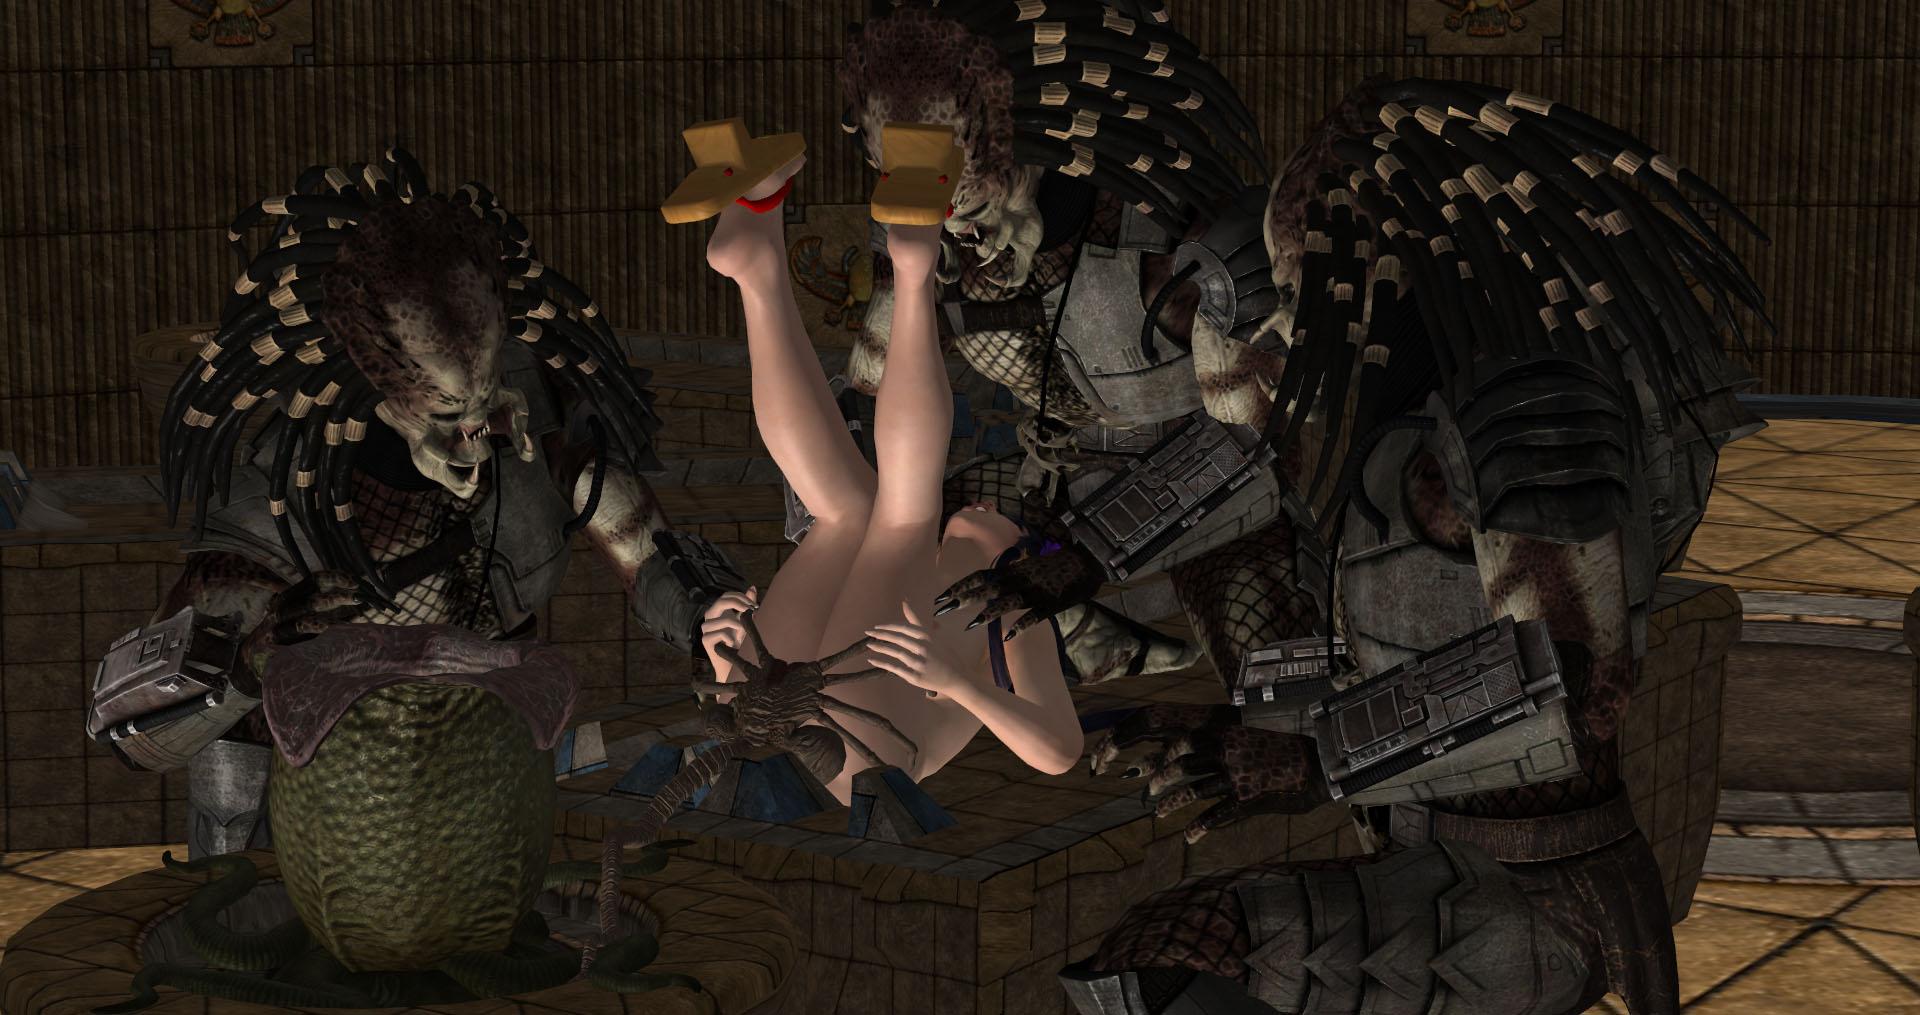 nyotengu_sacrifice_to_pussy_hugger_0064_layer_22_by_bitemonsters-dbgzclk.jpg